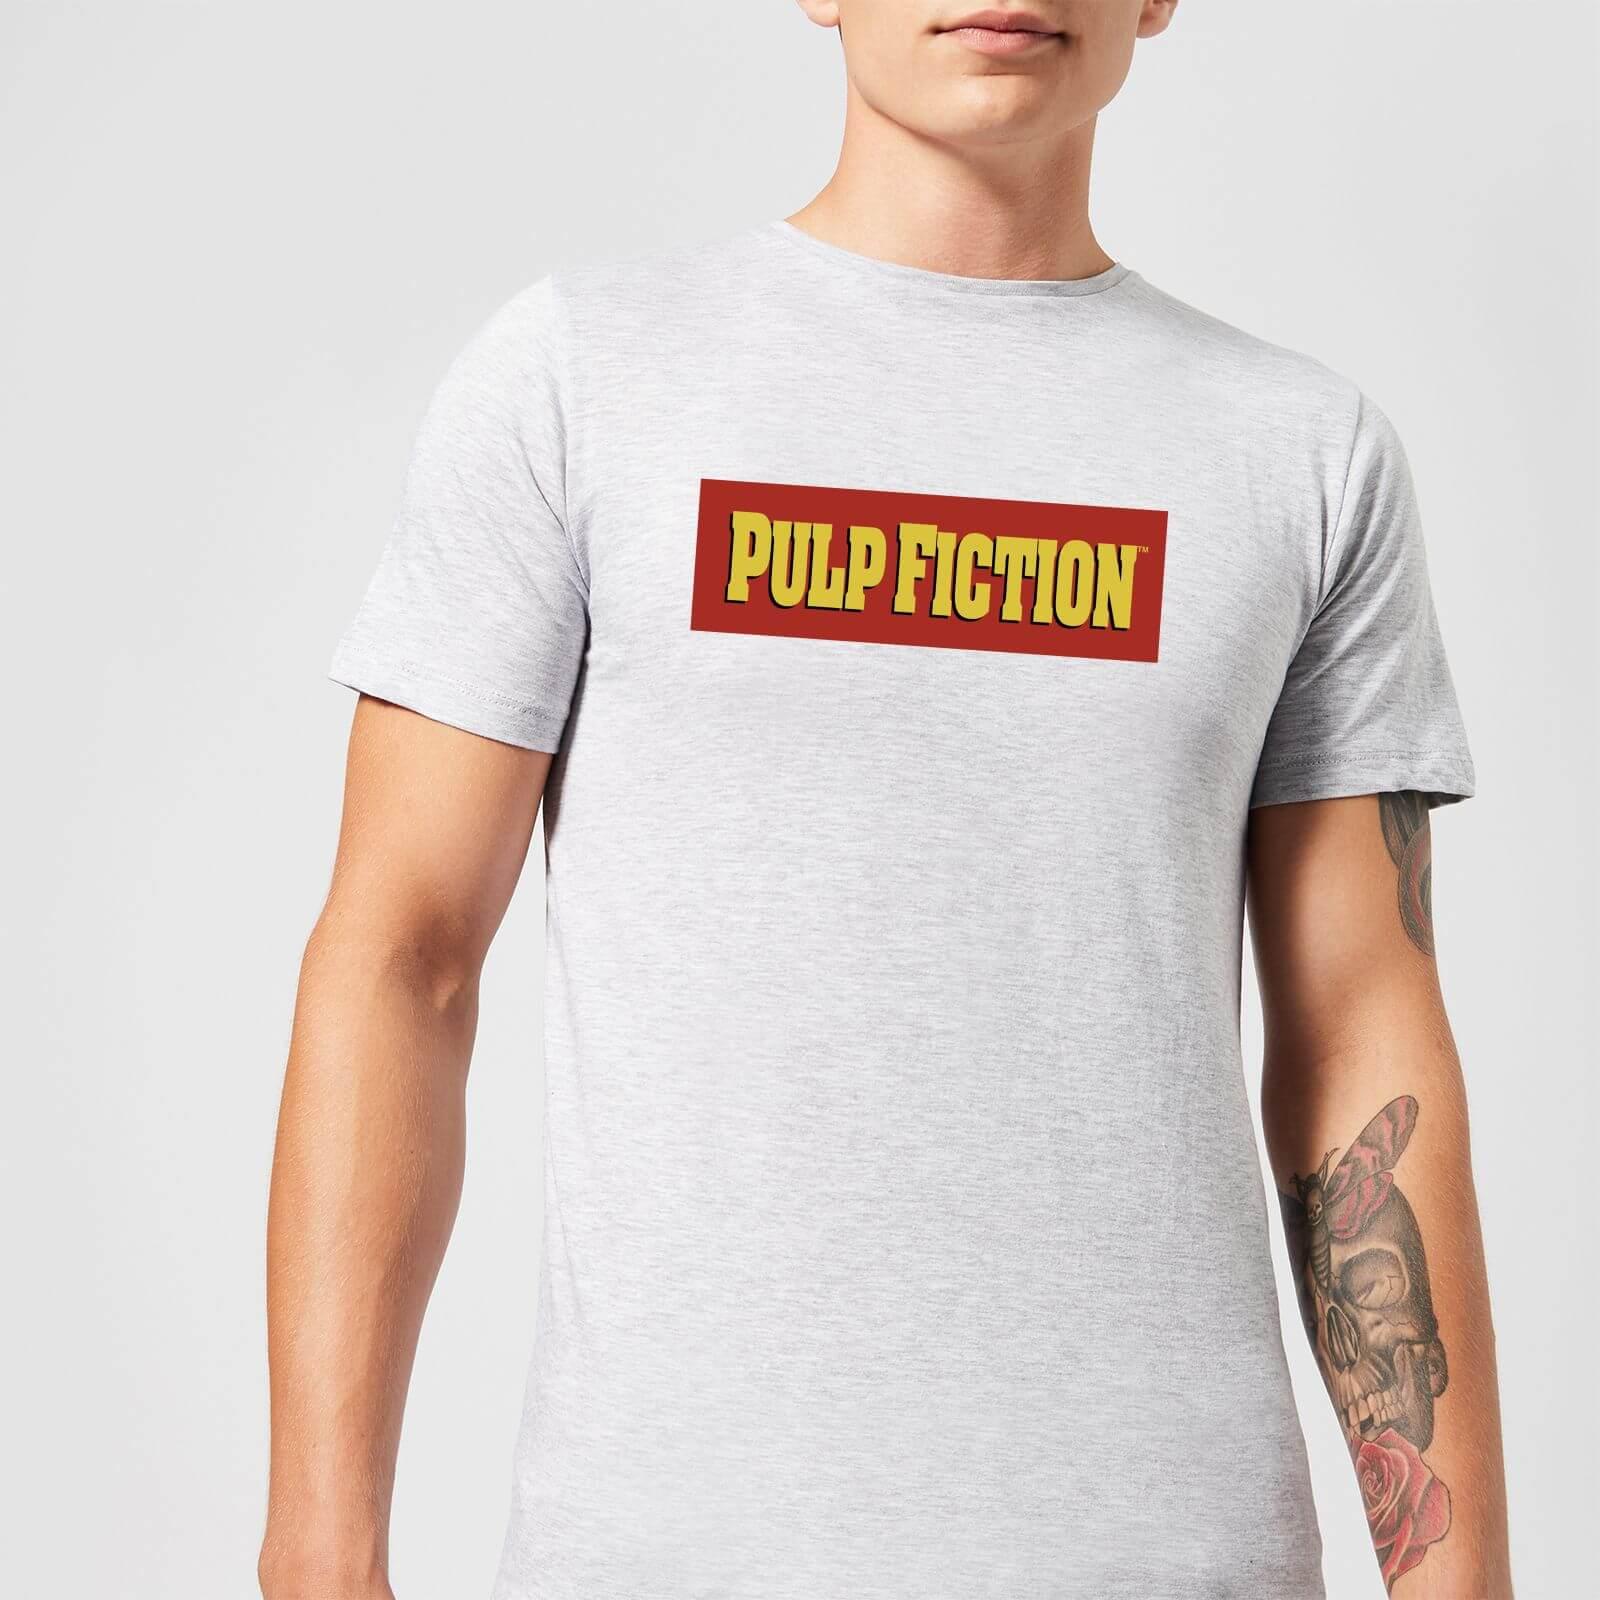 OfferteWeb.click 75-pulp-fiction-logo-men-s-t-shirt-grey-l-grigio